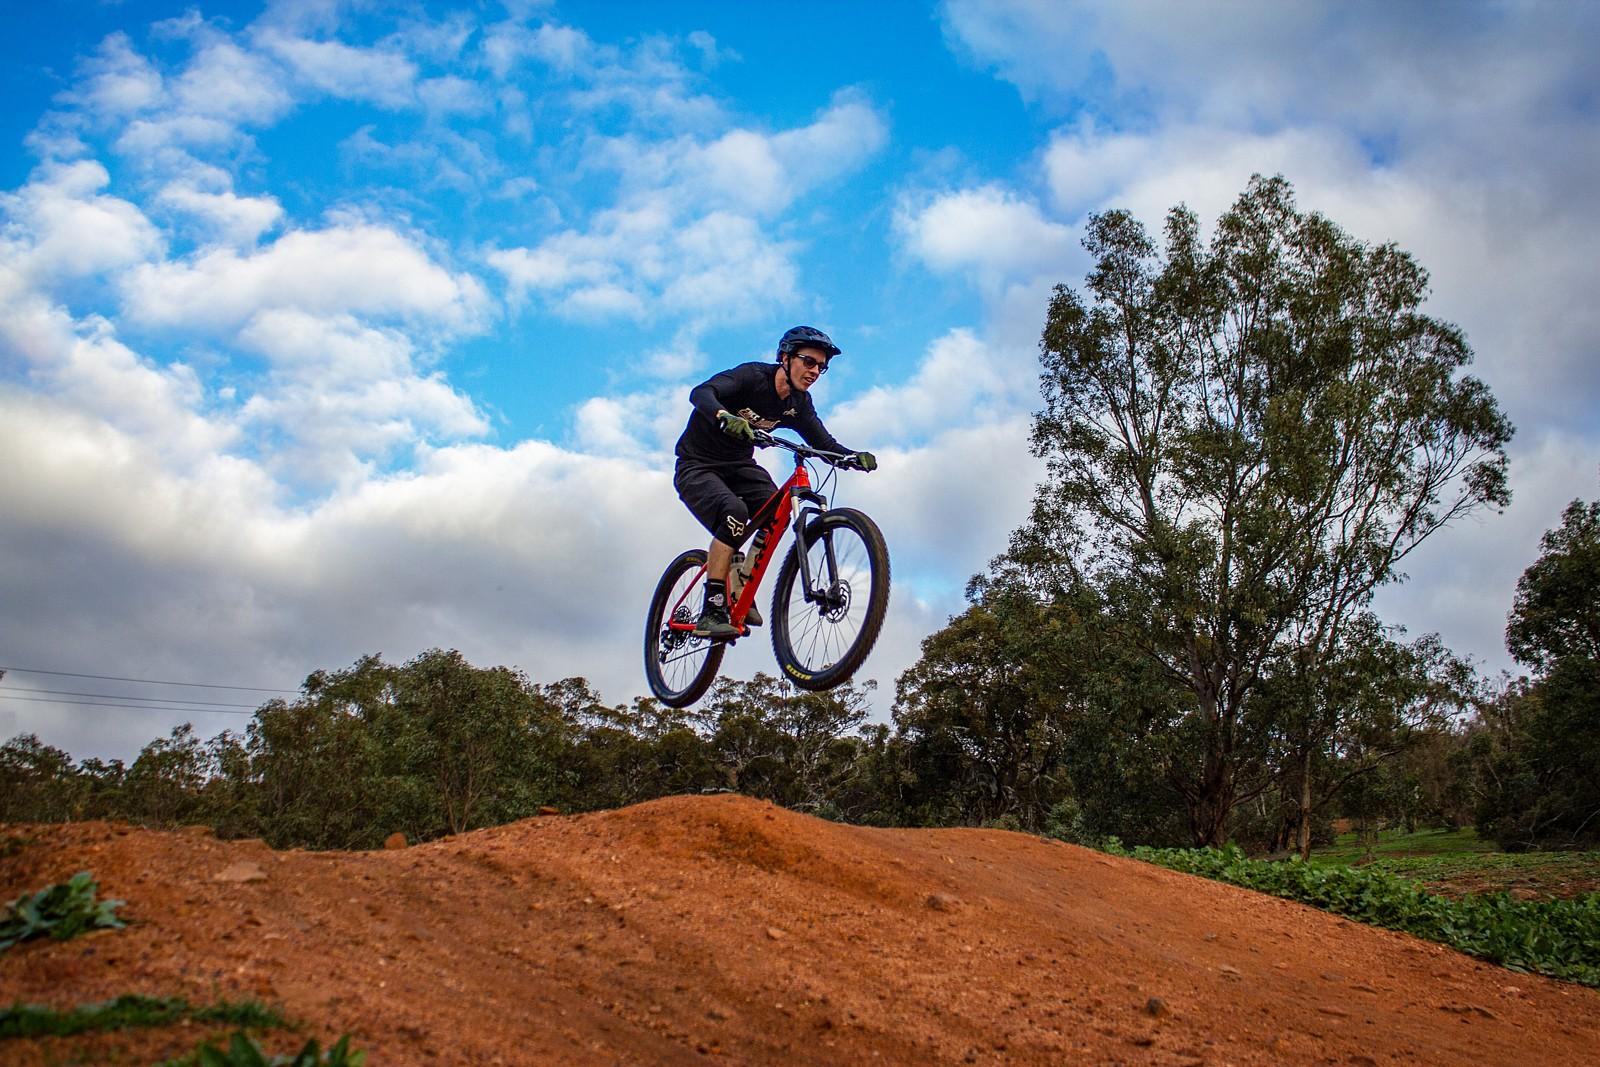 Matt Williams - StackArtPhotography - Mountain Biking Pictures - Vital MTB